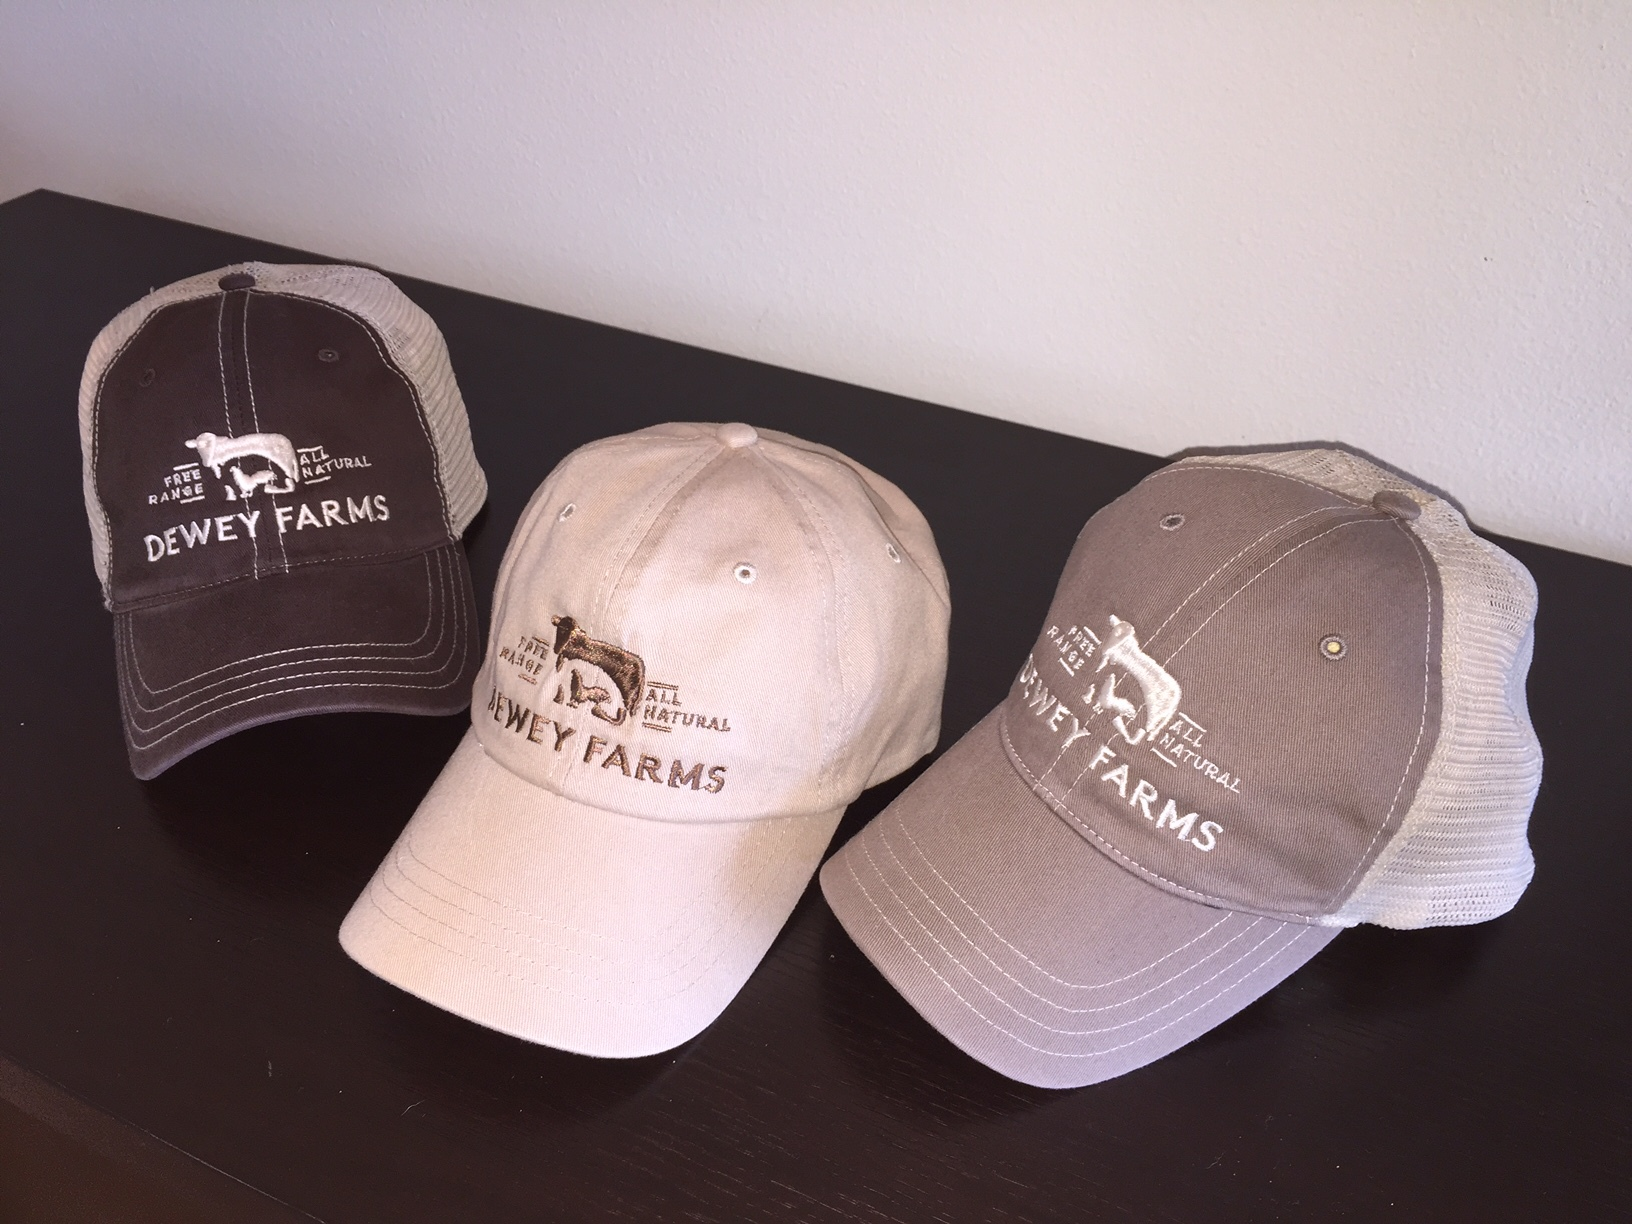 Dewey Farms hats